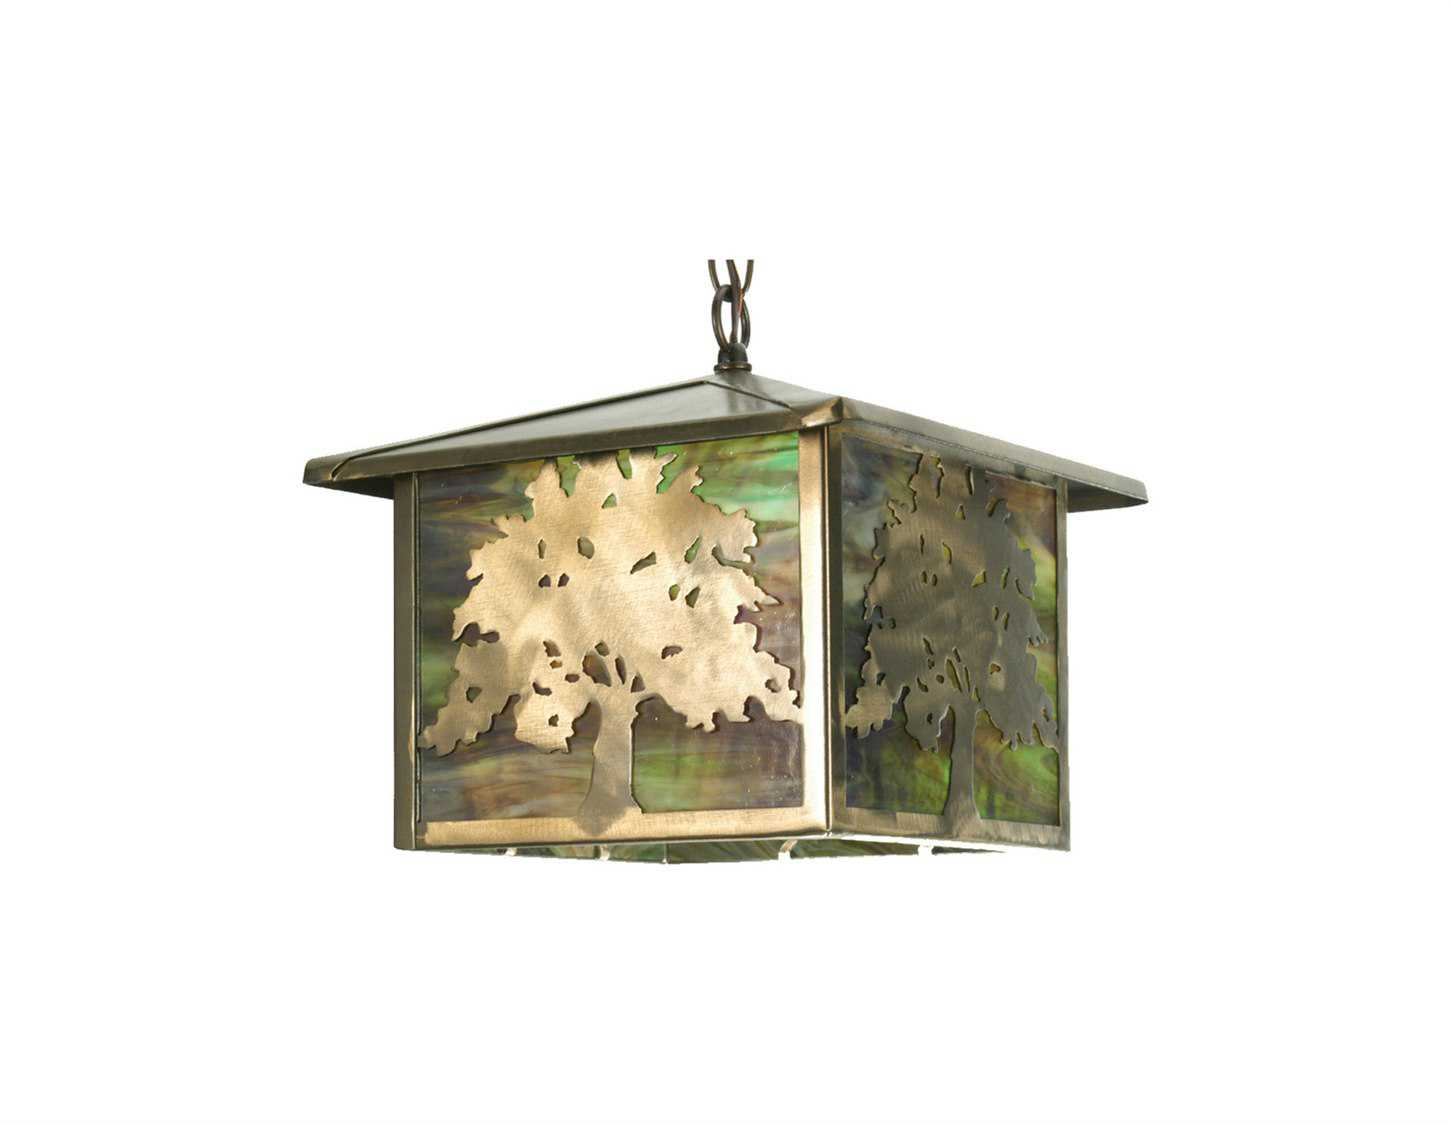 Meyda Tiffany Oak Tree Outdoor Hanging Light